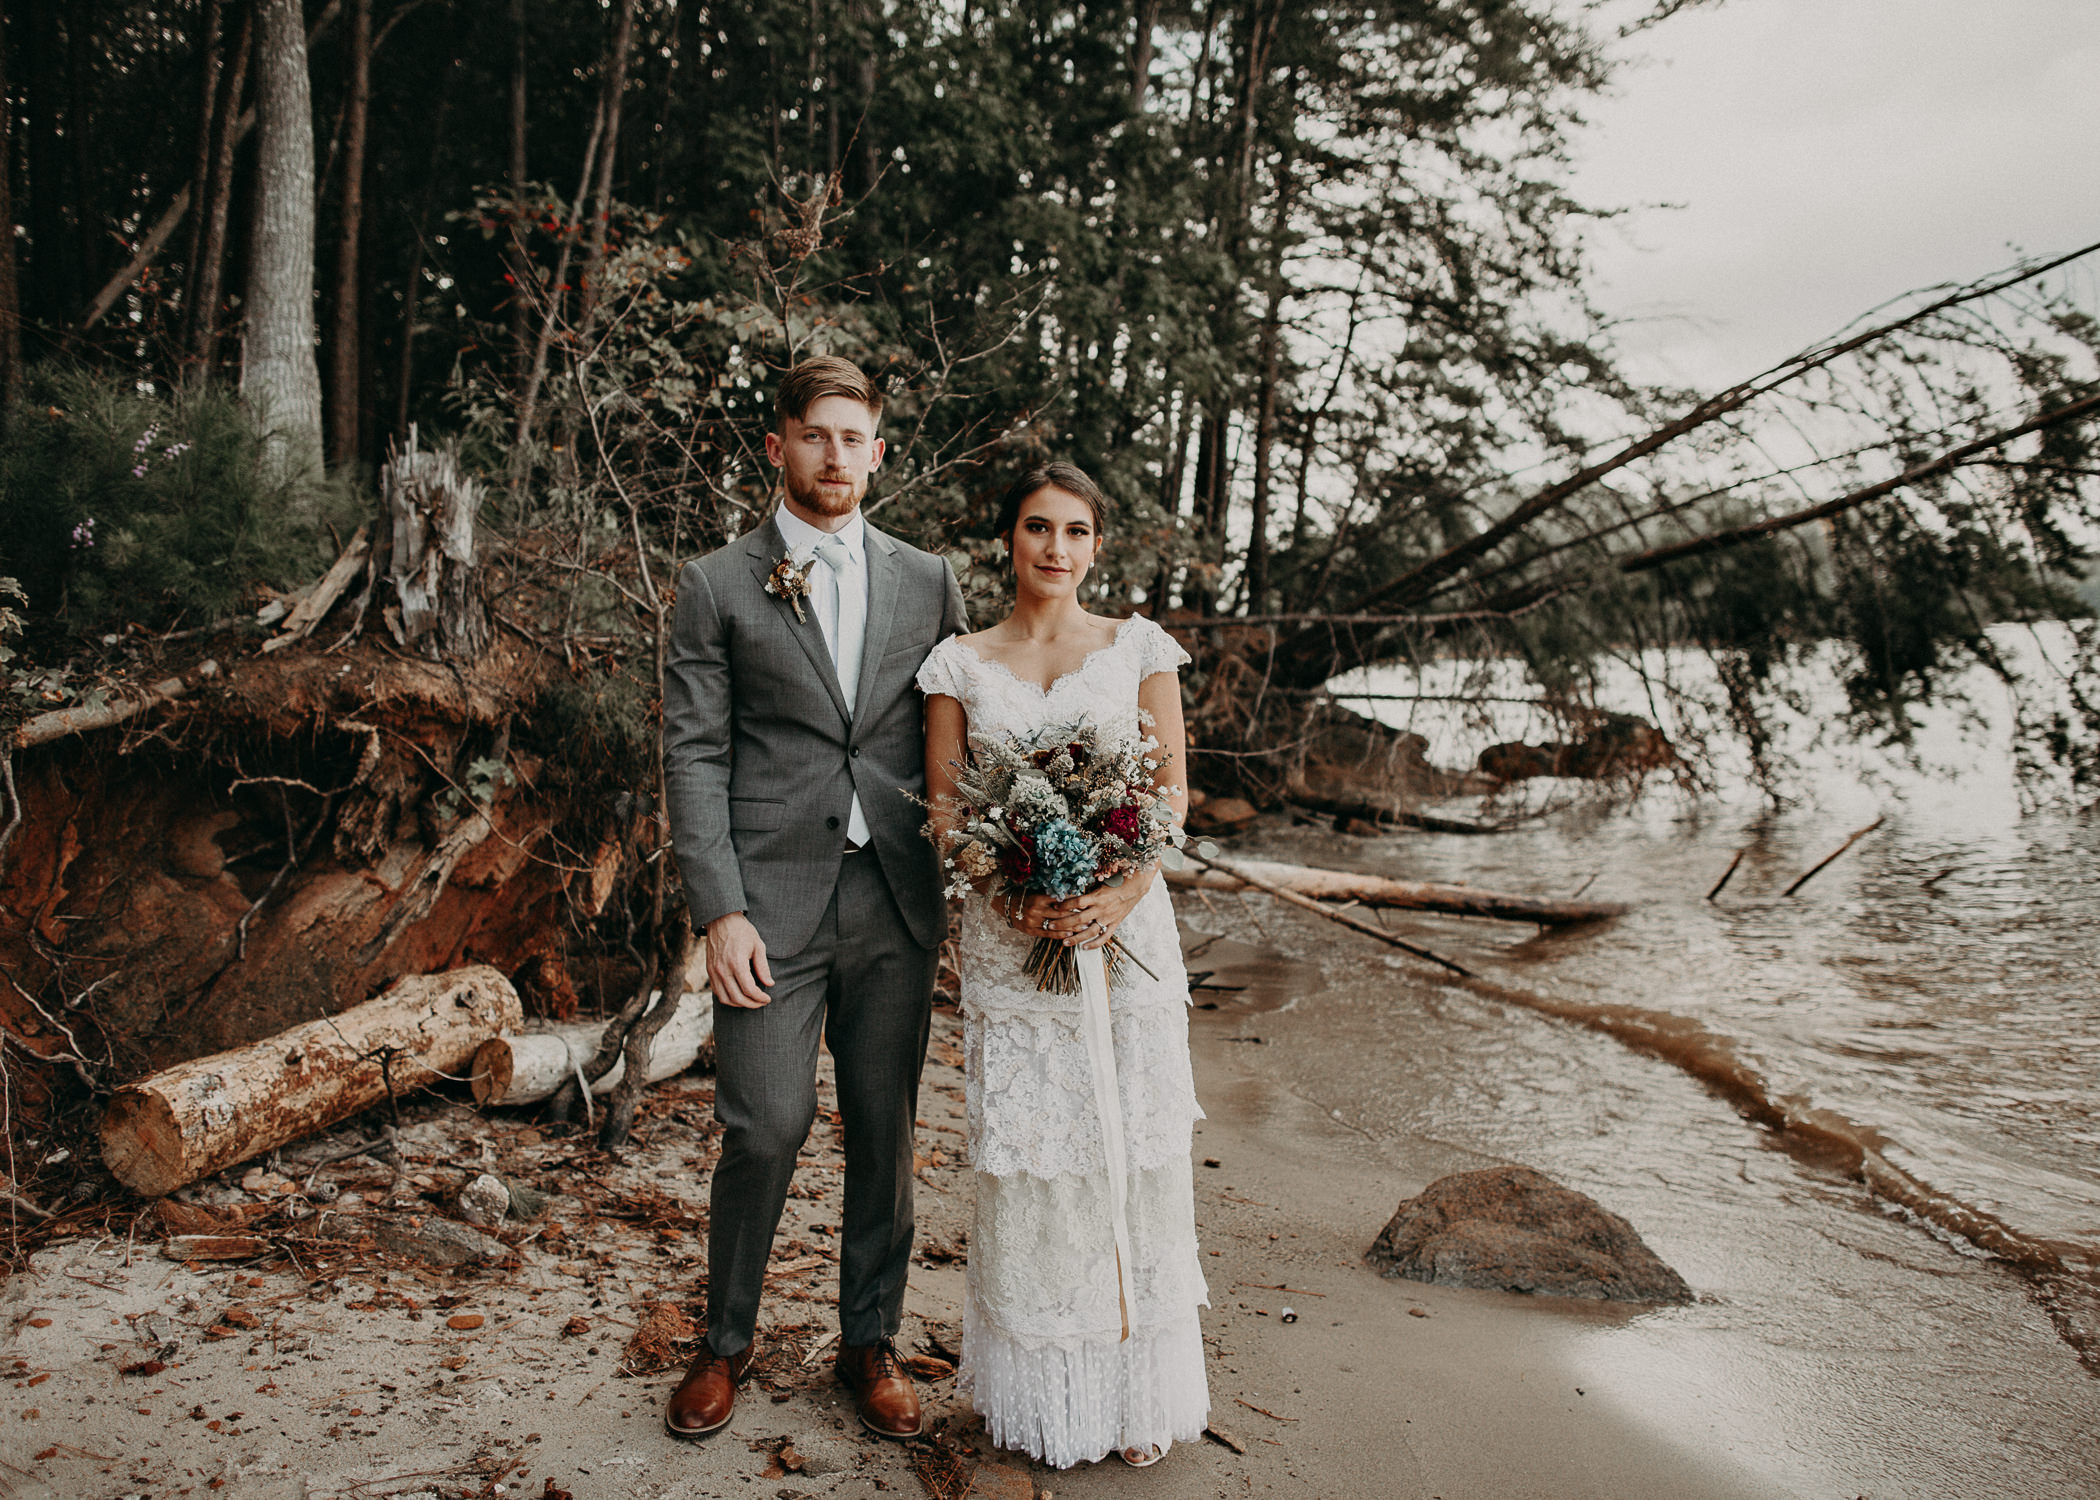 57 Bride & Groom Portraits before the ceremony on wedding day - Atlanta Wedding Photographer .jpg